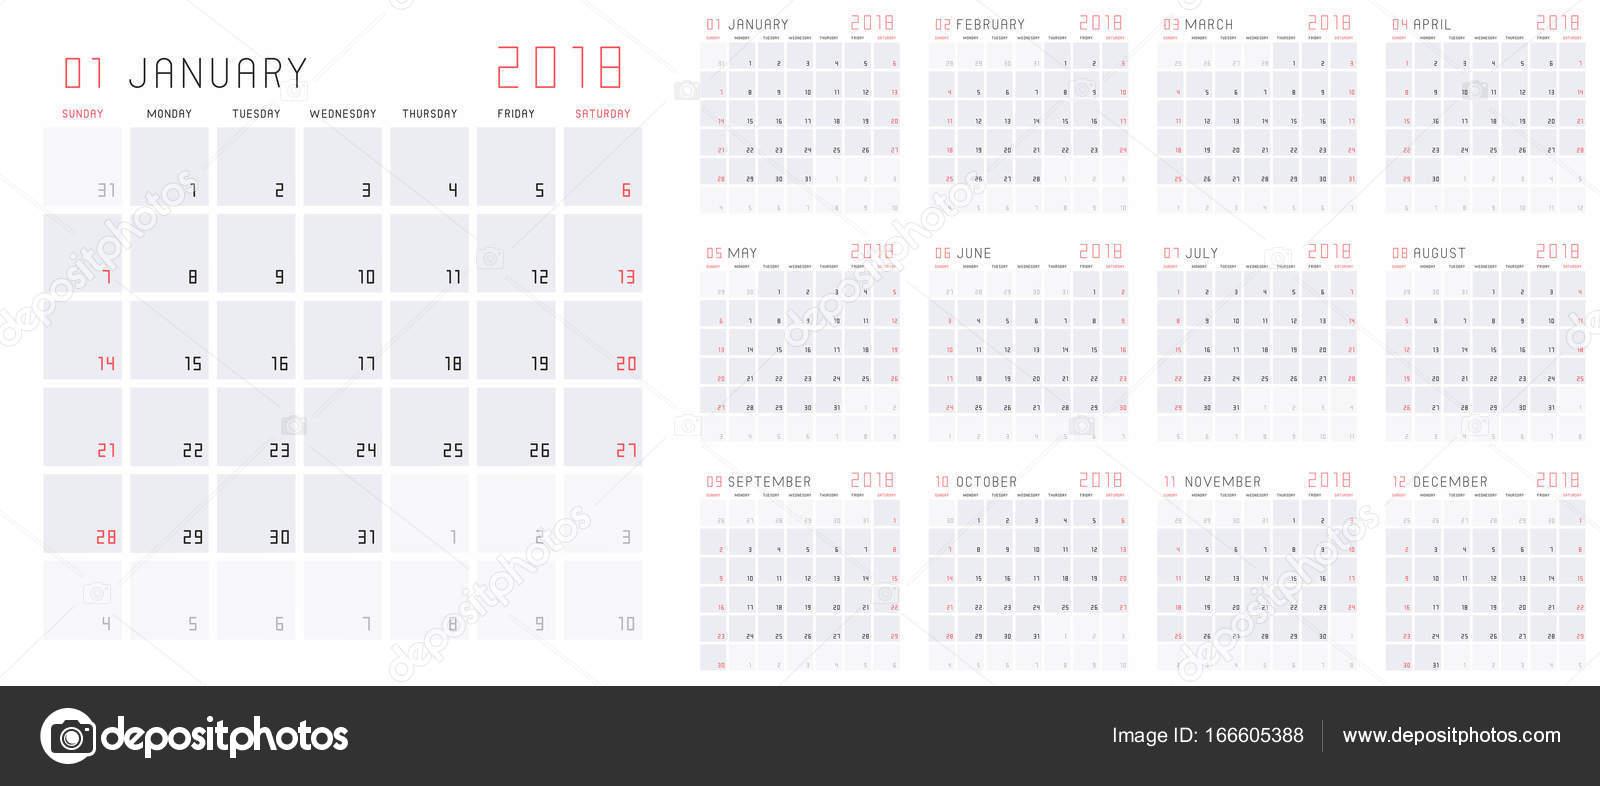 Englischen Kalender 2018 — Stockvektor © NataliiaVolyk #166605388